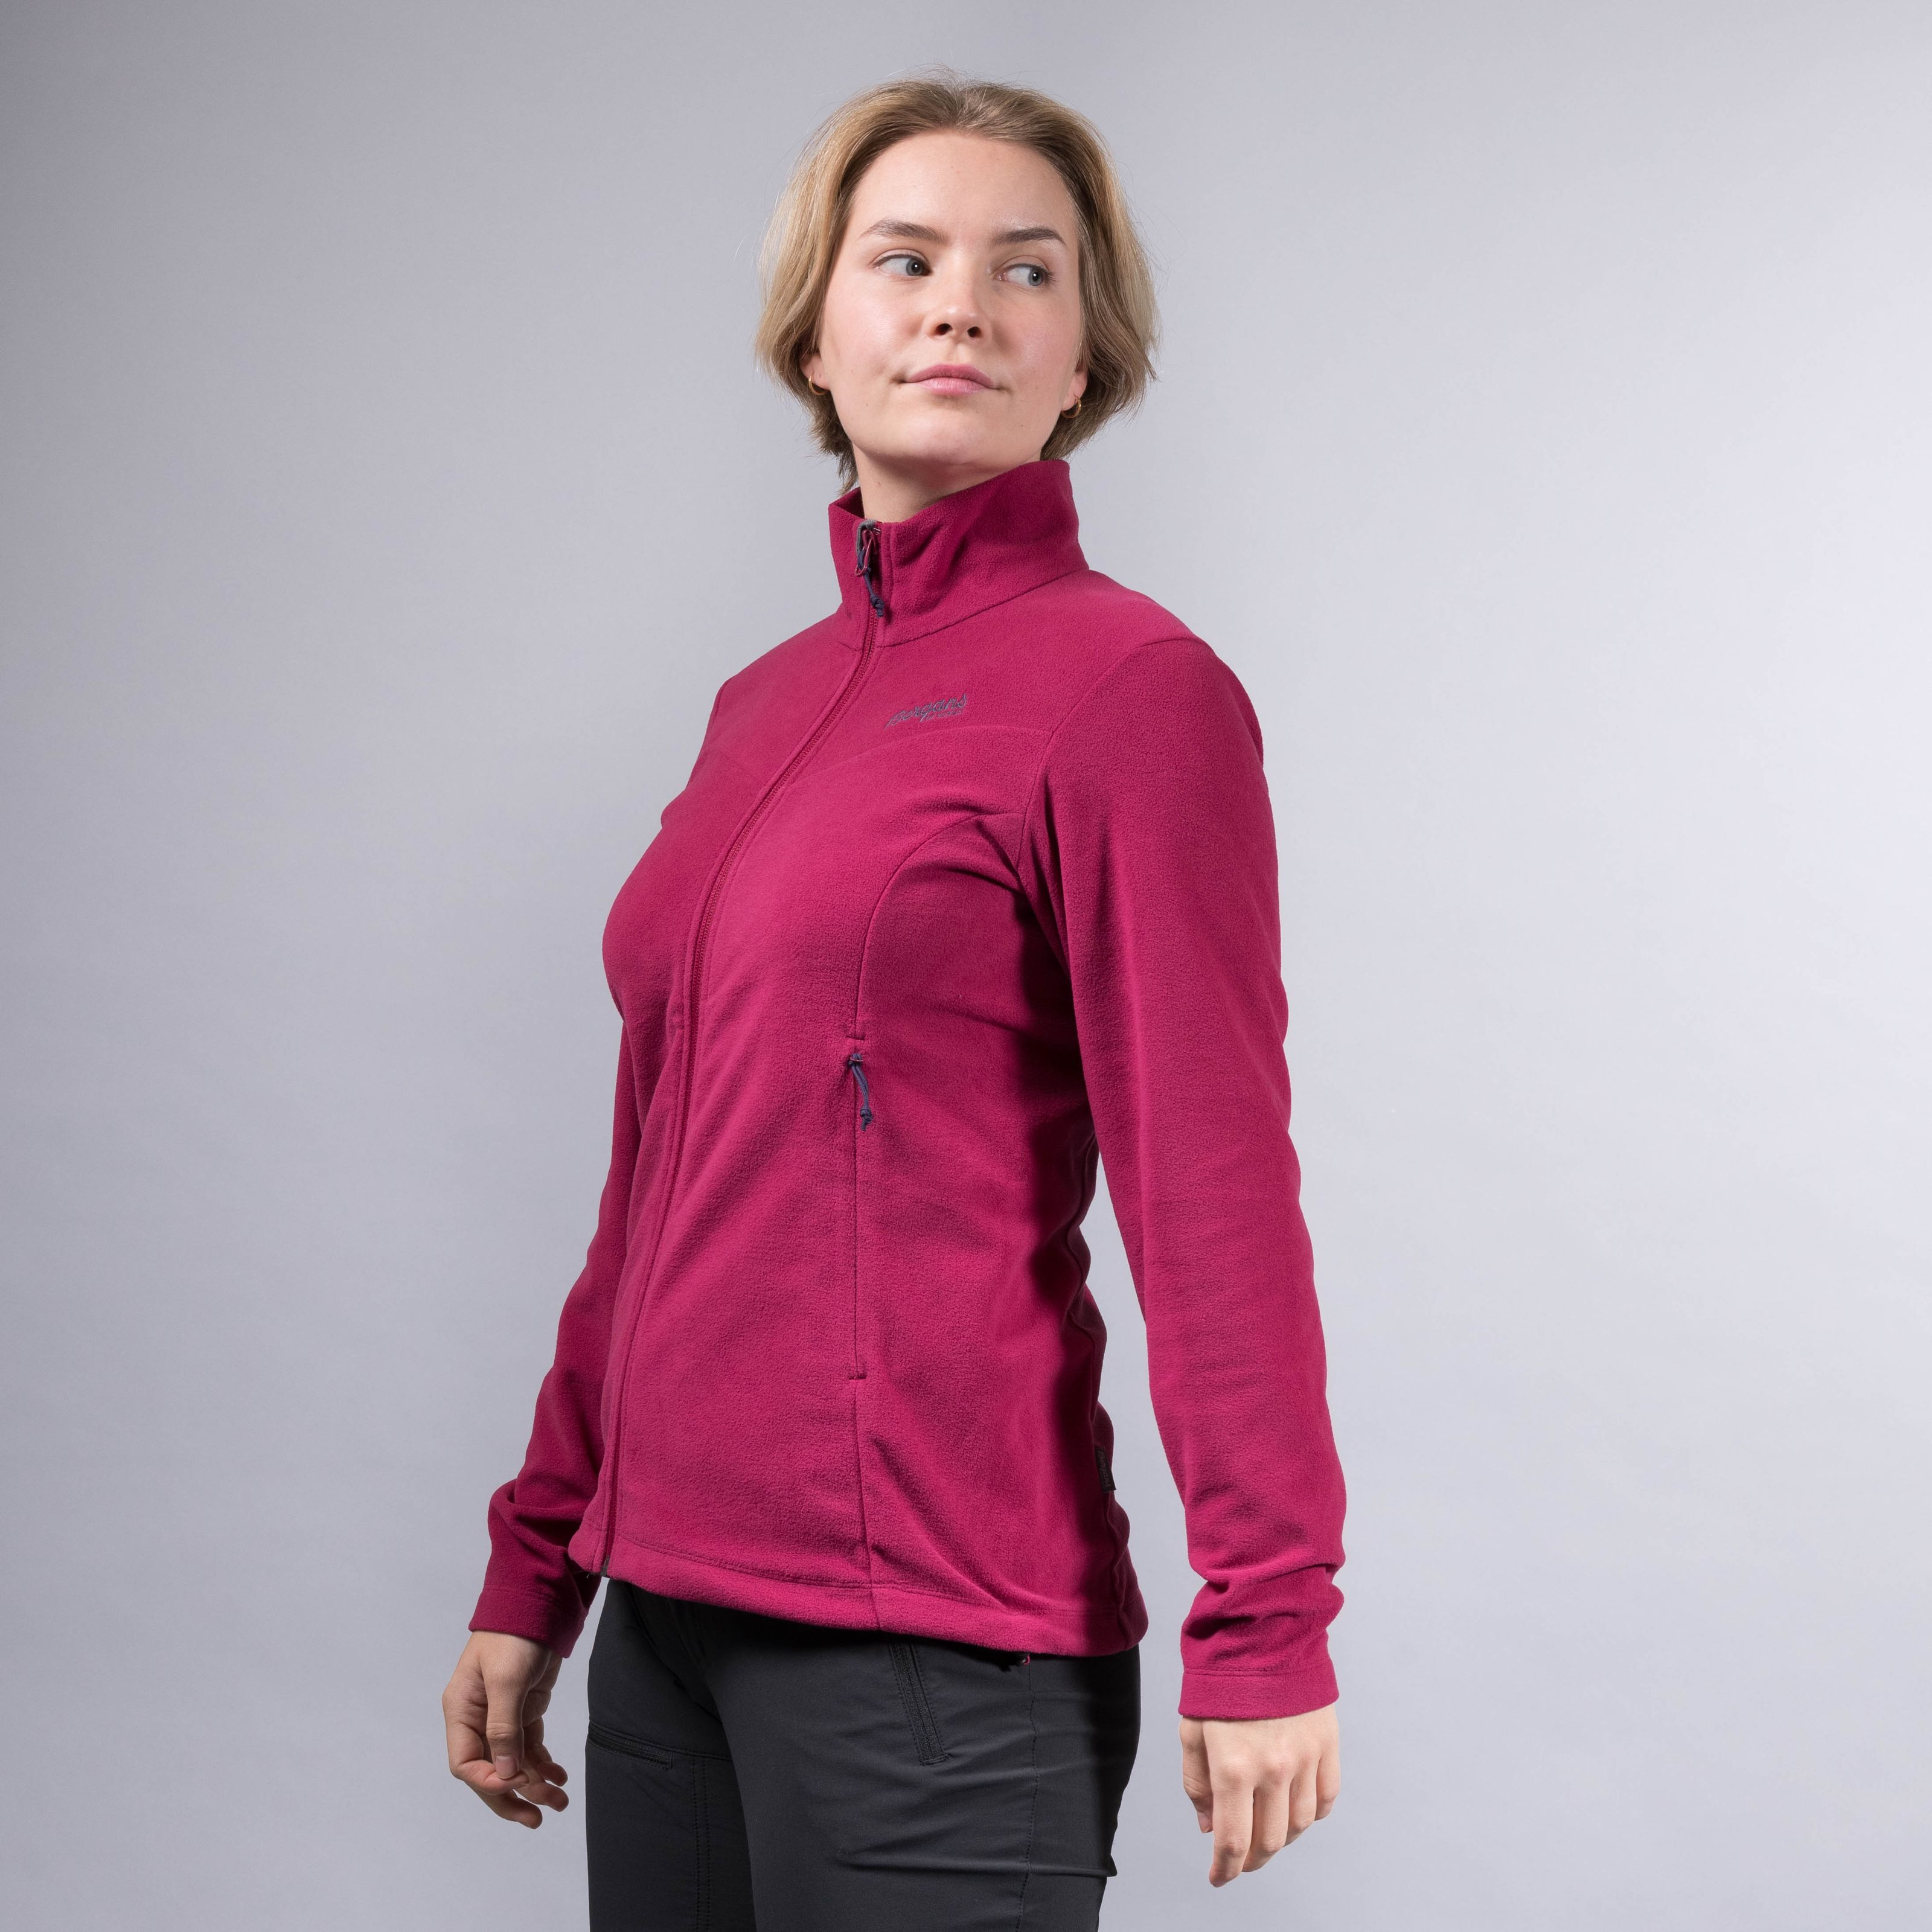 Bergans Finnsnes Fleece Jacket Dame | SportsDeal